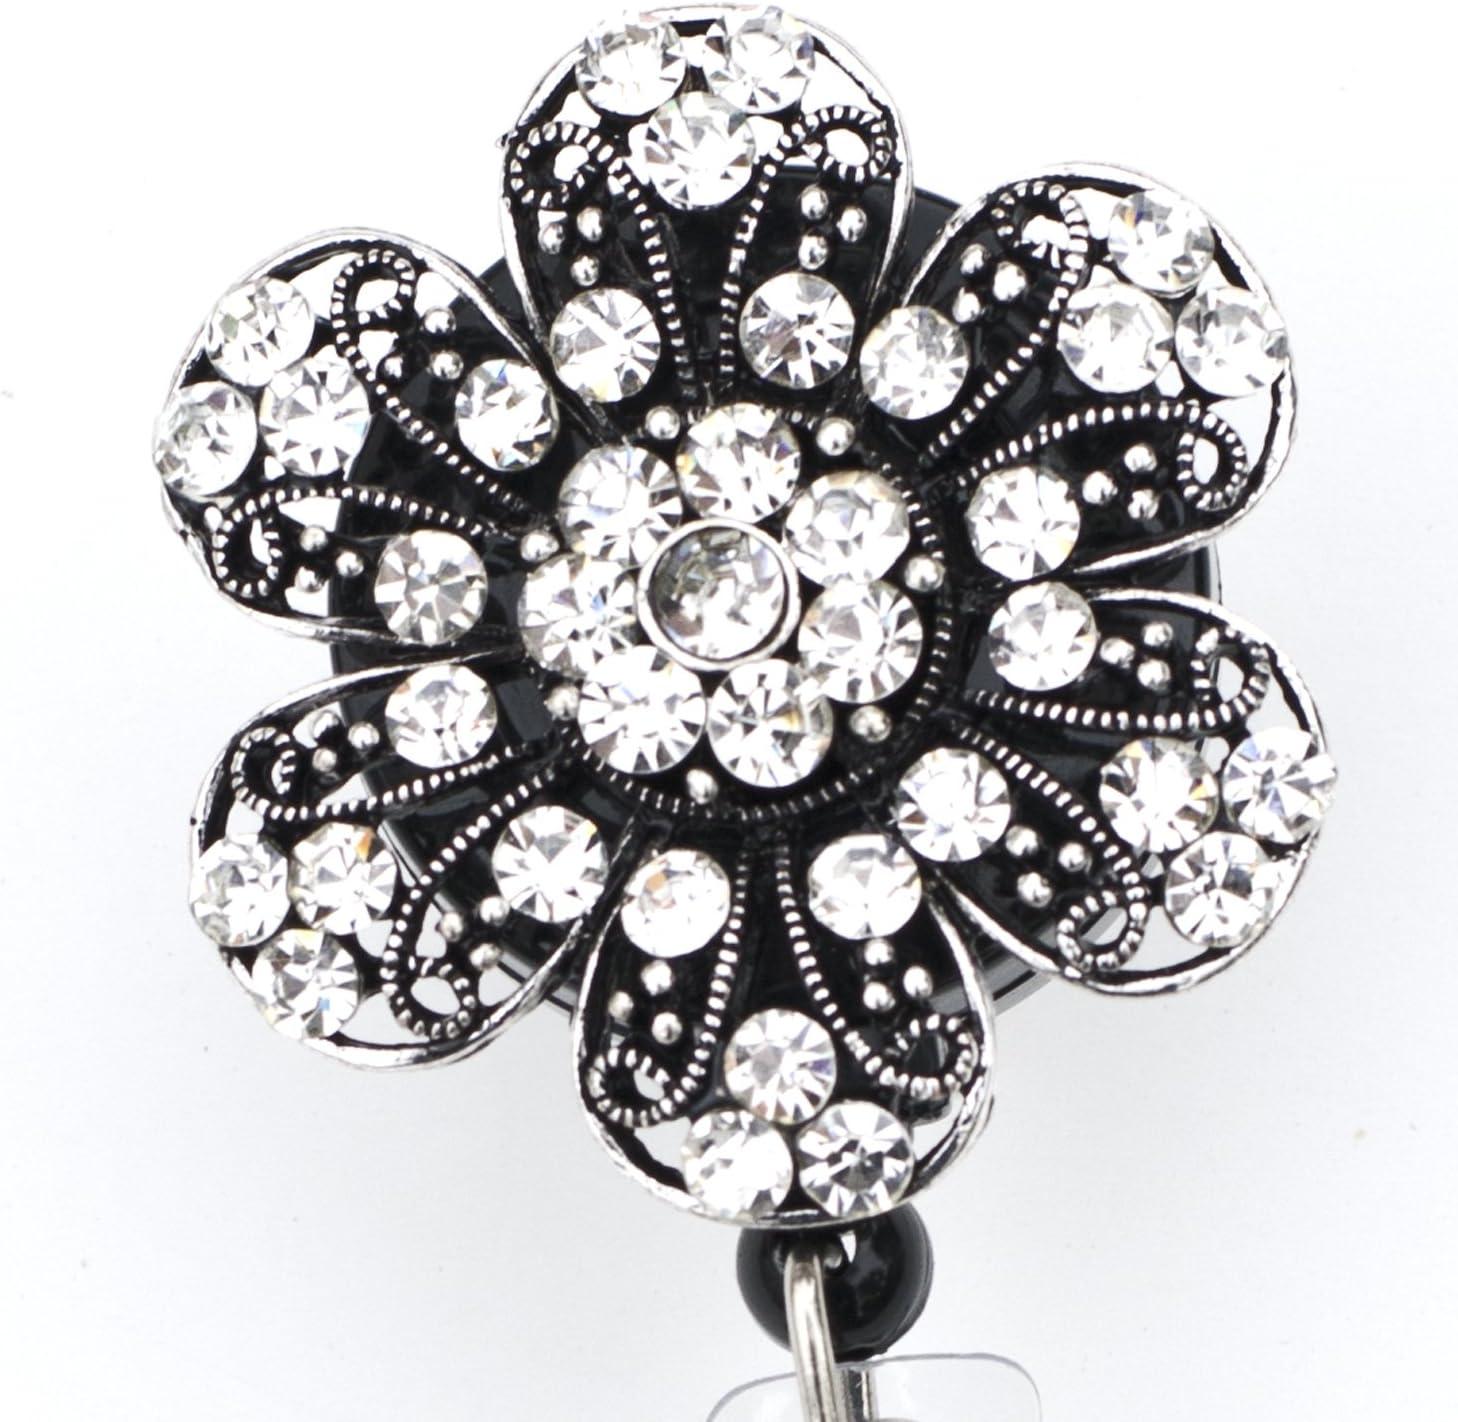 Alligator or Slide Clip AB Rhinestone Flower SPARKLE Retractable Reel ID Badge Holder You pick Reel Style